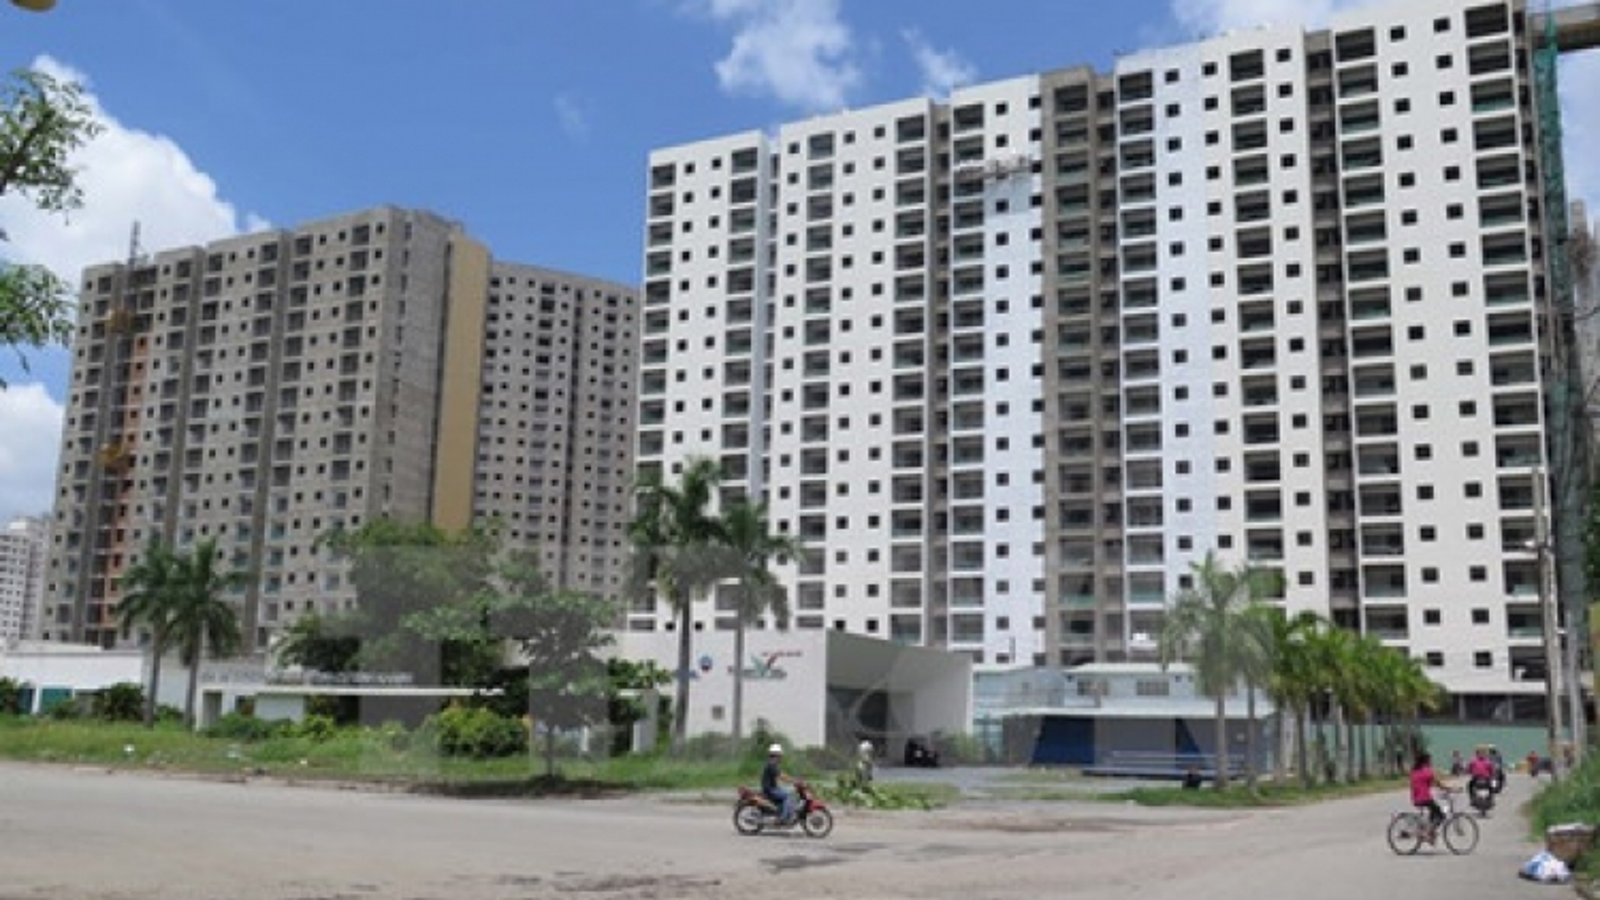 SBV: Still much room for property loans